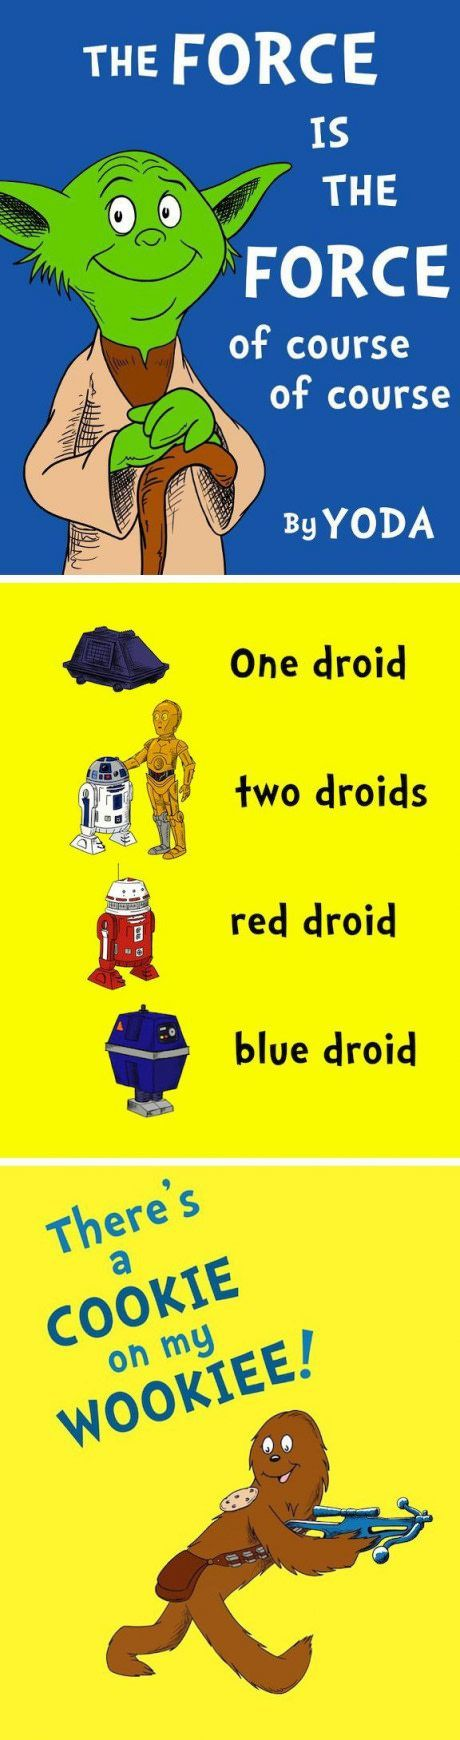 Star Wars x Dr Seuss                                                                                                                                                      More